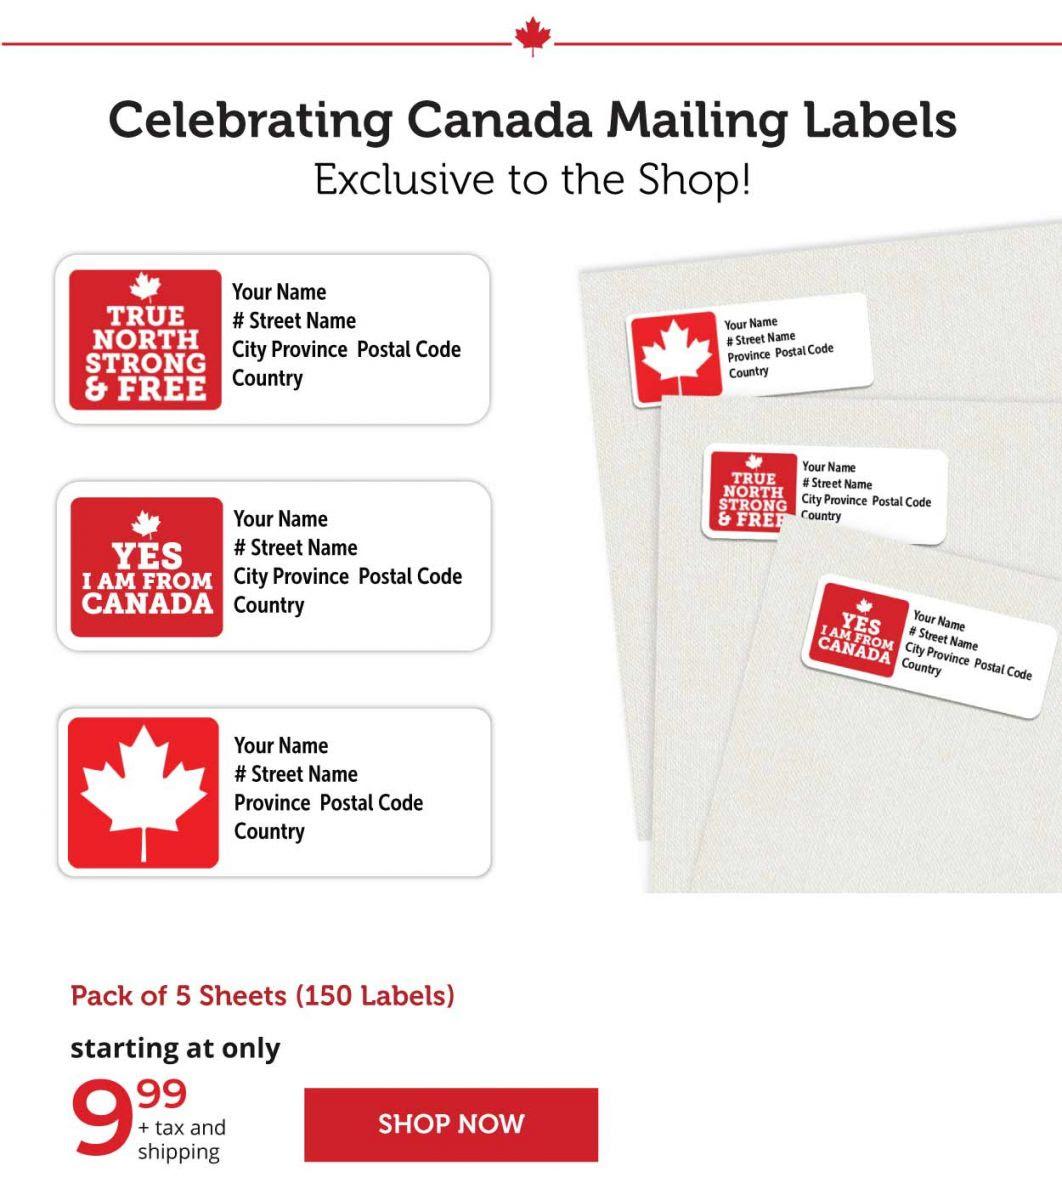 Celebrating Canada Mailing Labels